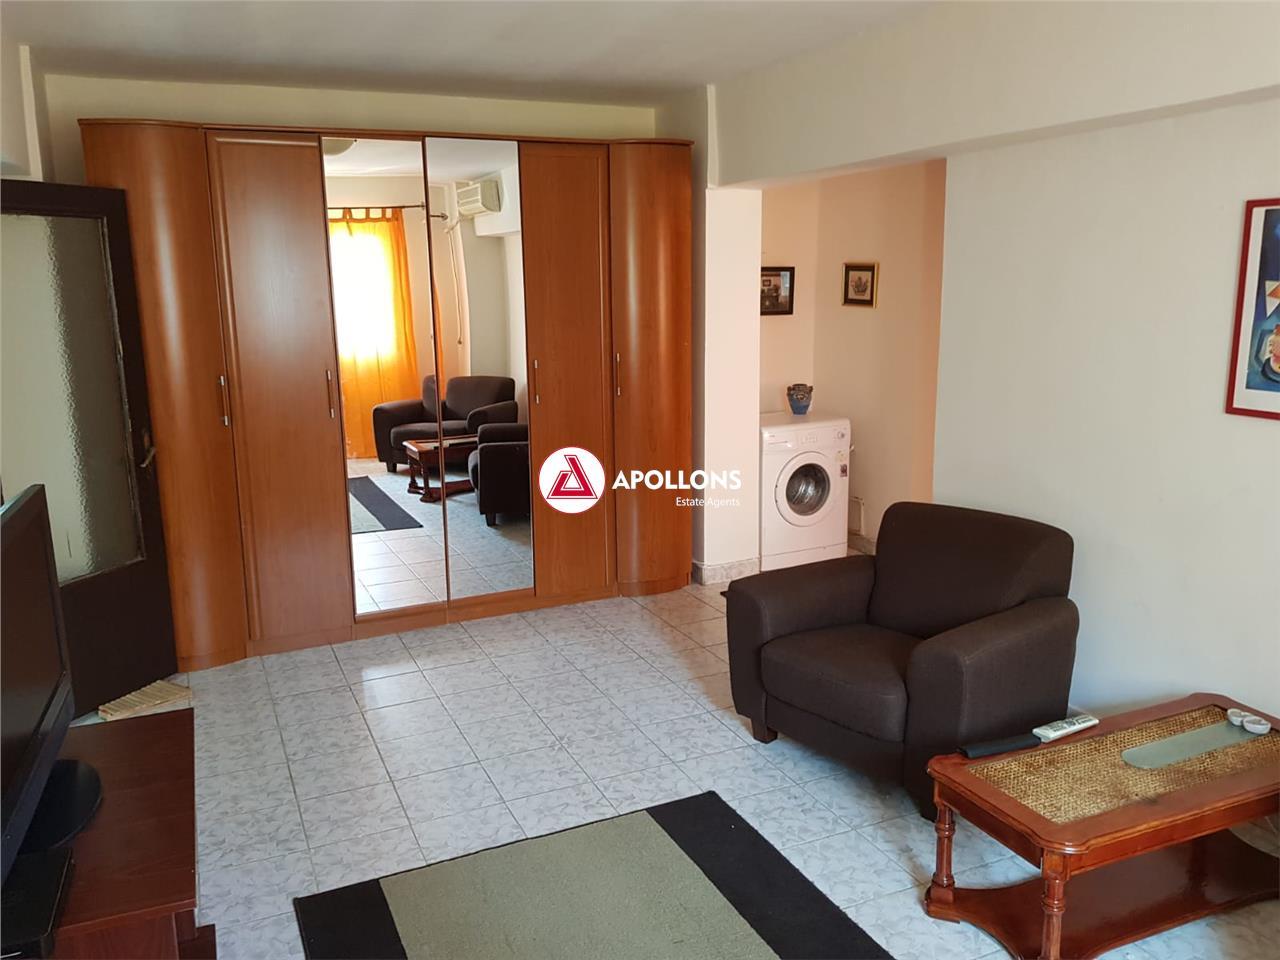 Vanzare Apartament 2 camere St. cel Mare, Bucuresti